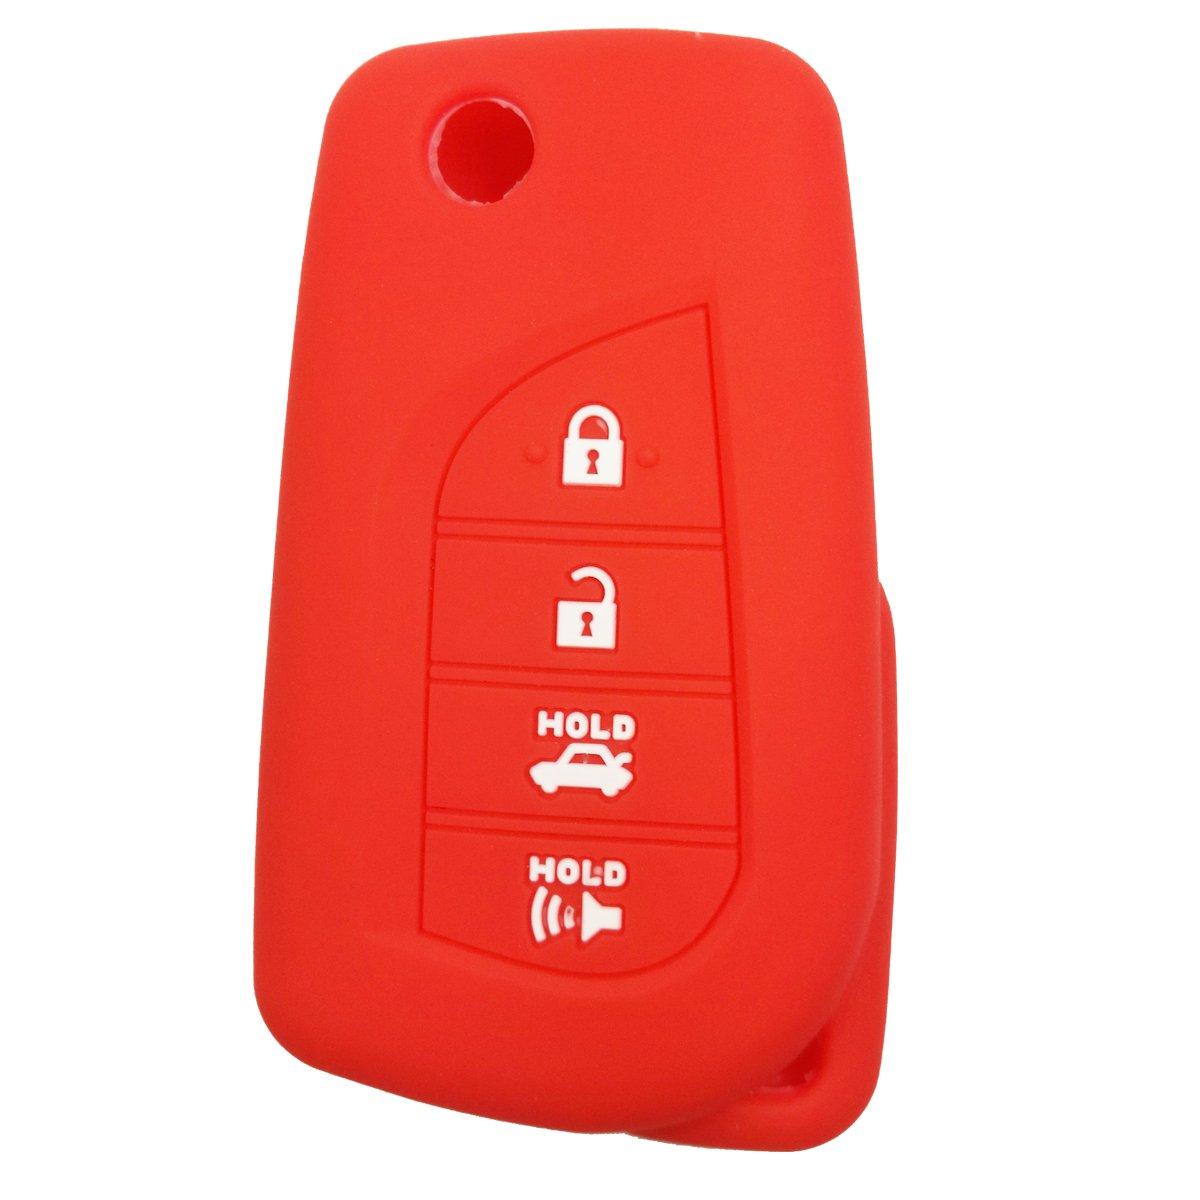 Coolbestda Rubber 4 Buttons Flip Folding Key Fob Remote Cover Case Keyless Jacket Protector for Toyota Camry 4-Runner RAV4 Highlander Yaris HYQ12BFB